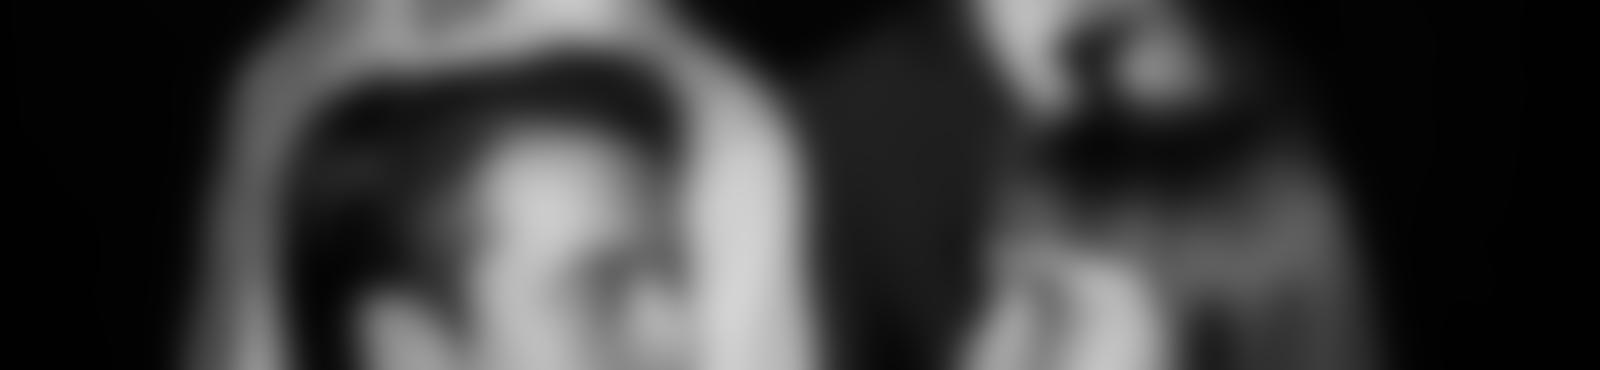 Blurred 1d7c9fc0 fbe4 4062 92cc 76a19e3cc371